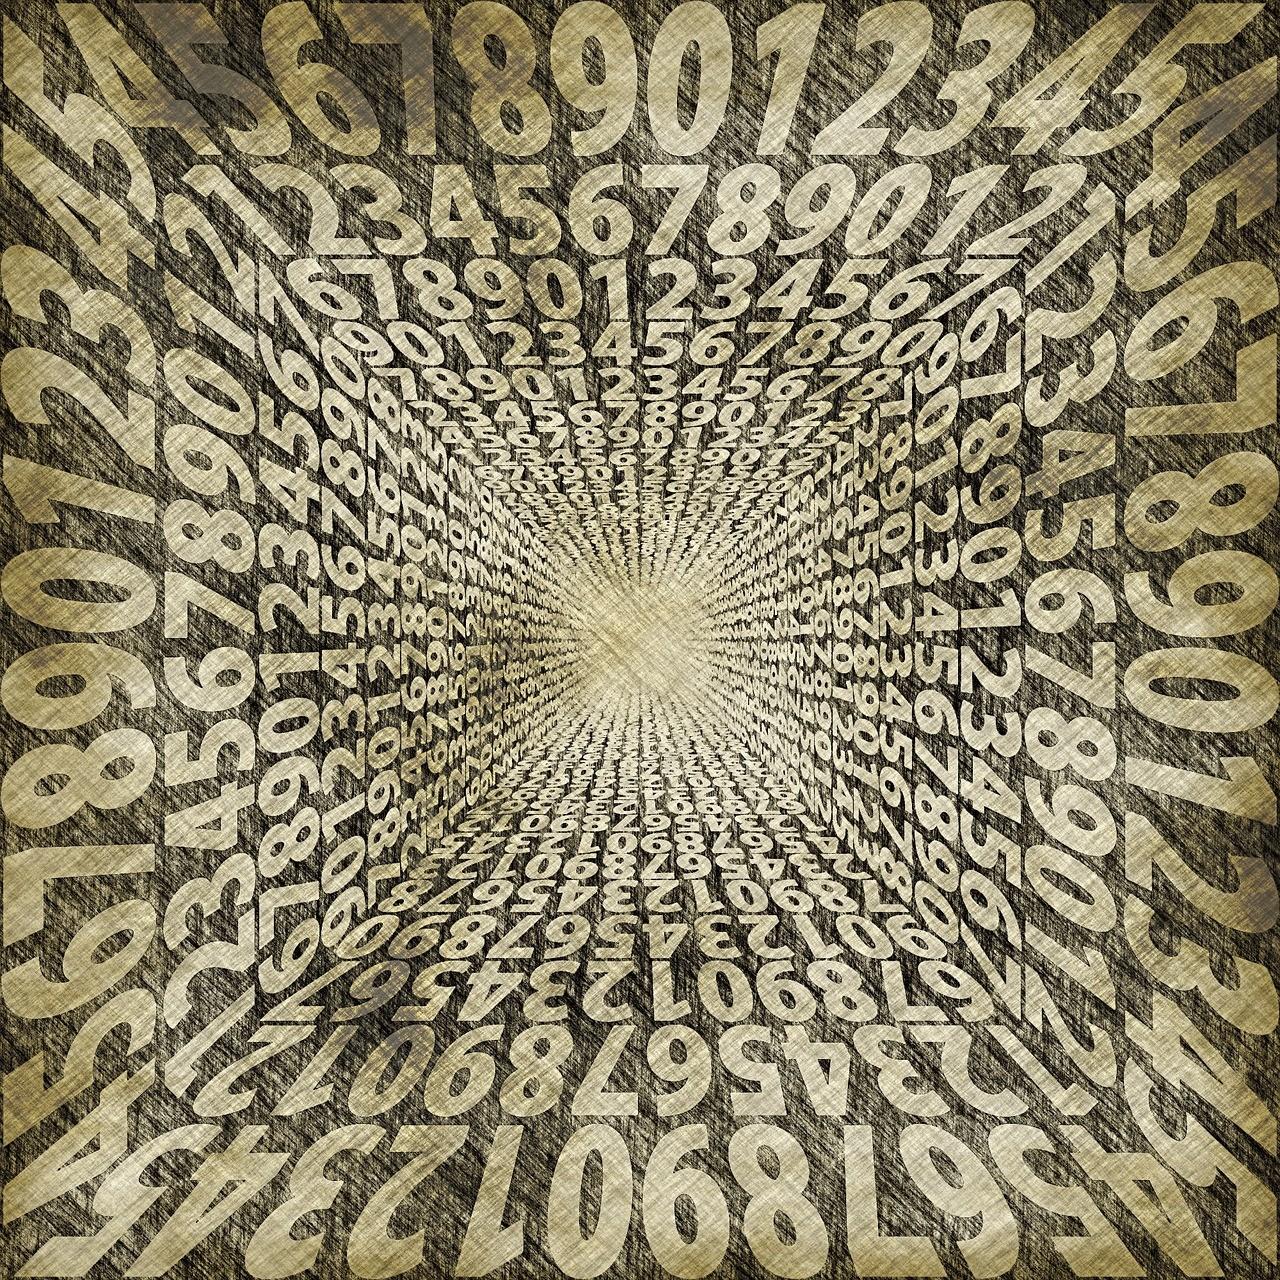 https://divinityworld.com/wp-content/uploads/2020/12/numerology-grid.jpg